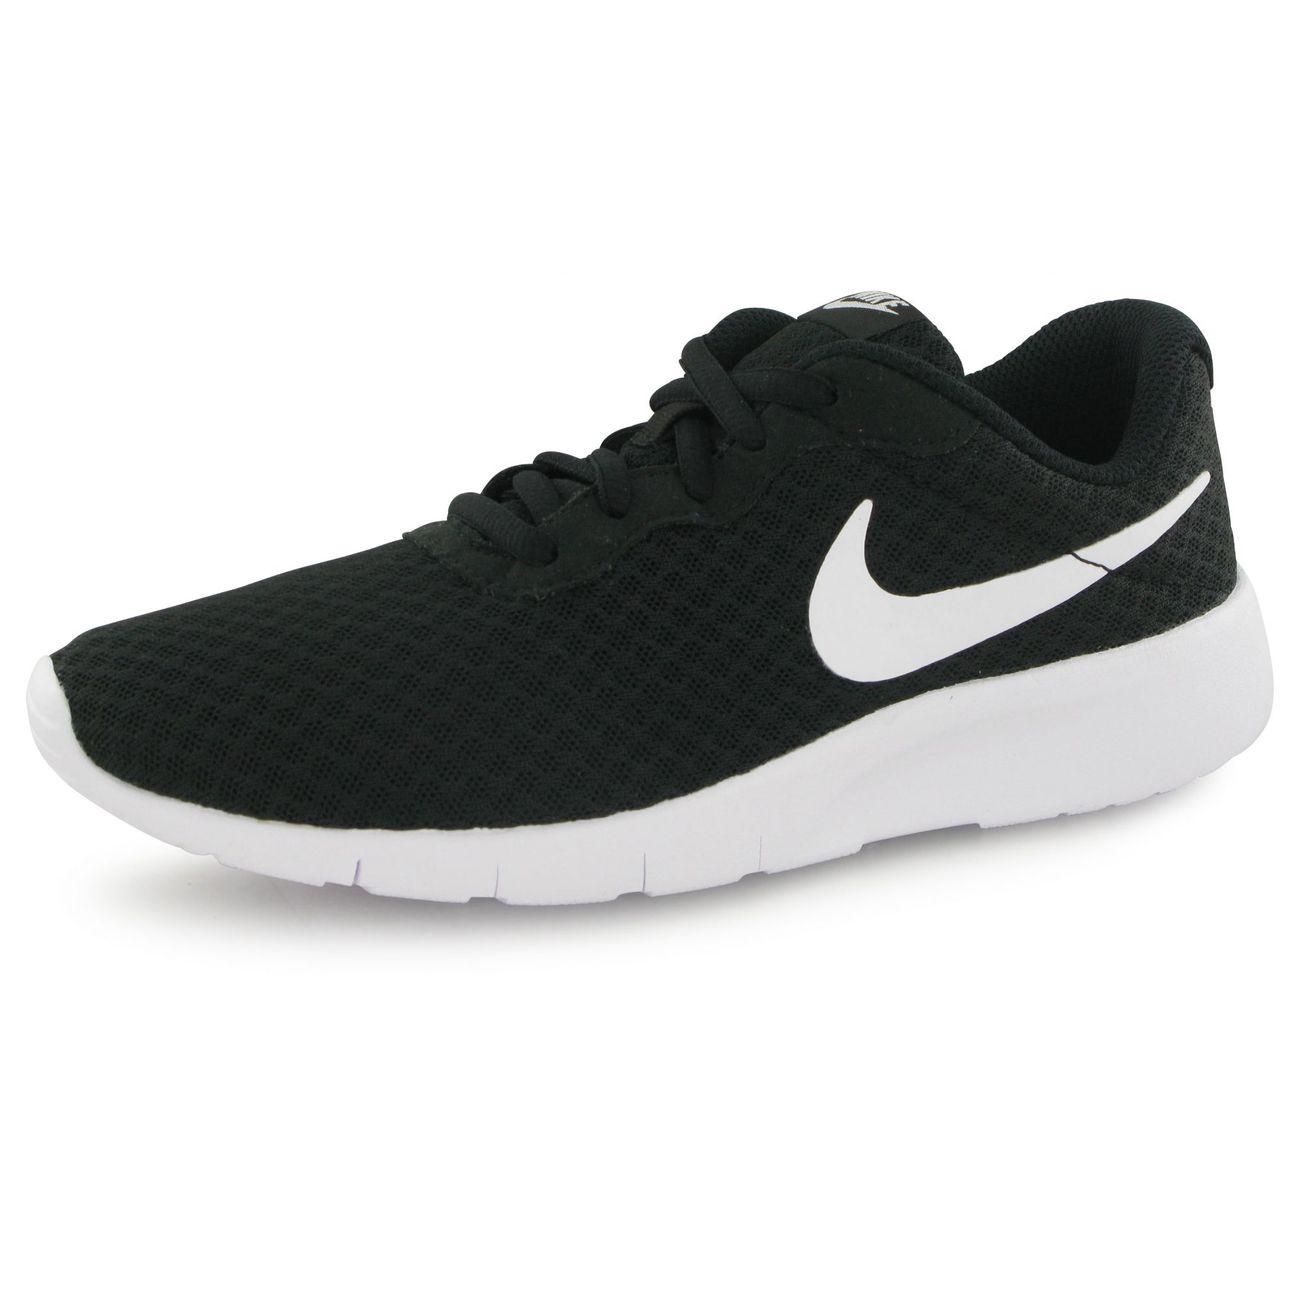 Nike Tanjun noir, baskets mode enfant – achat pas cher GO